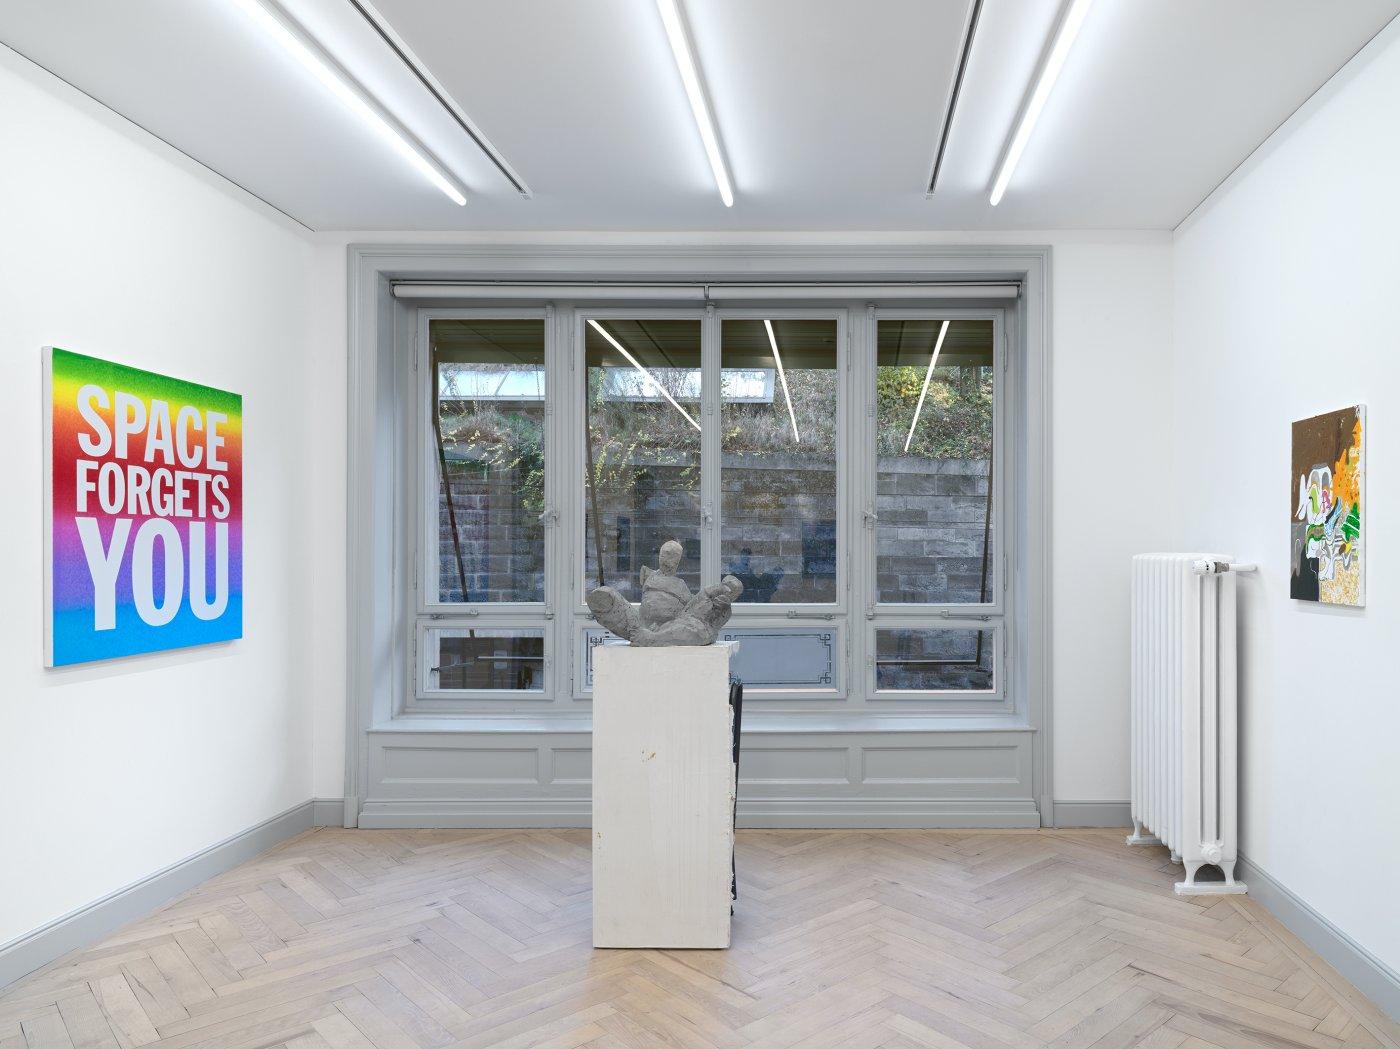 Galerie Eva Presenhuber All in One 6